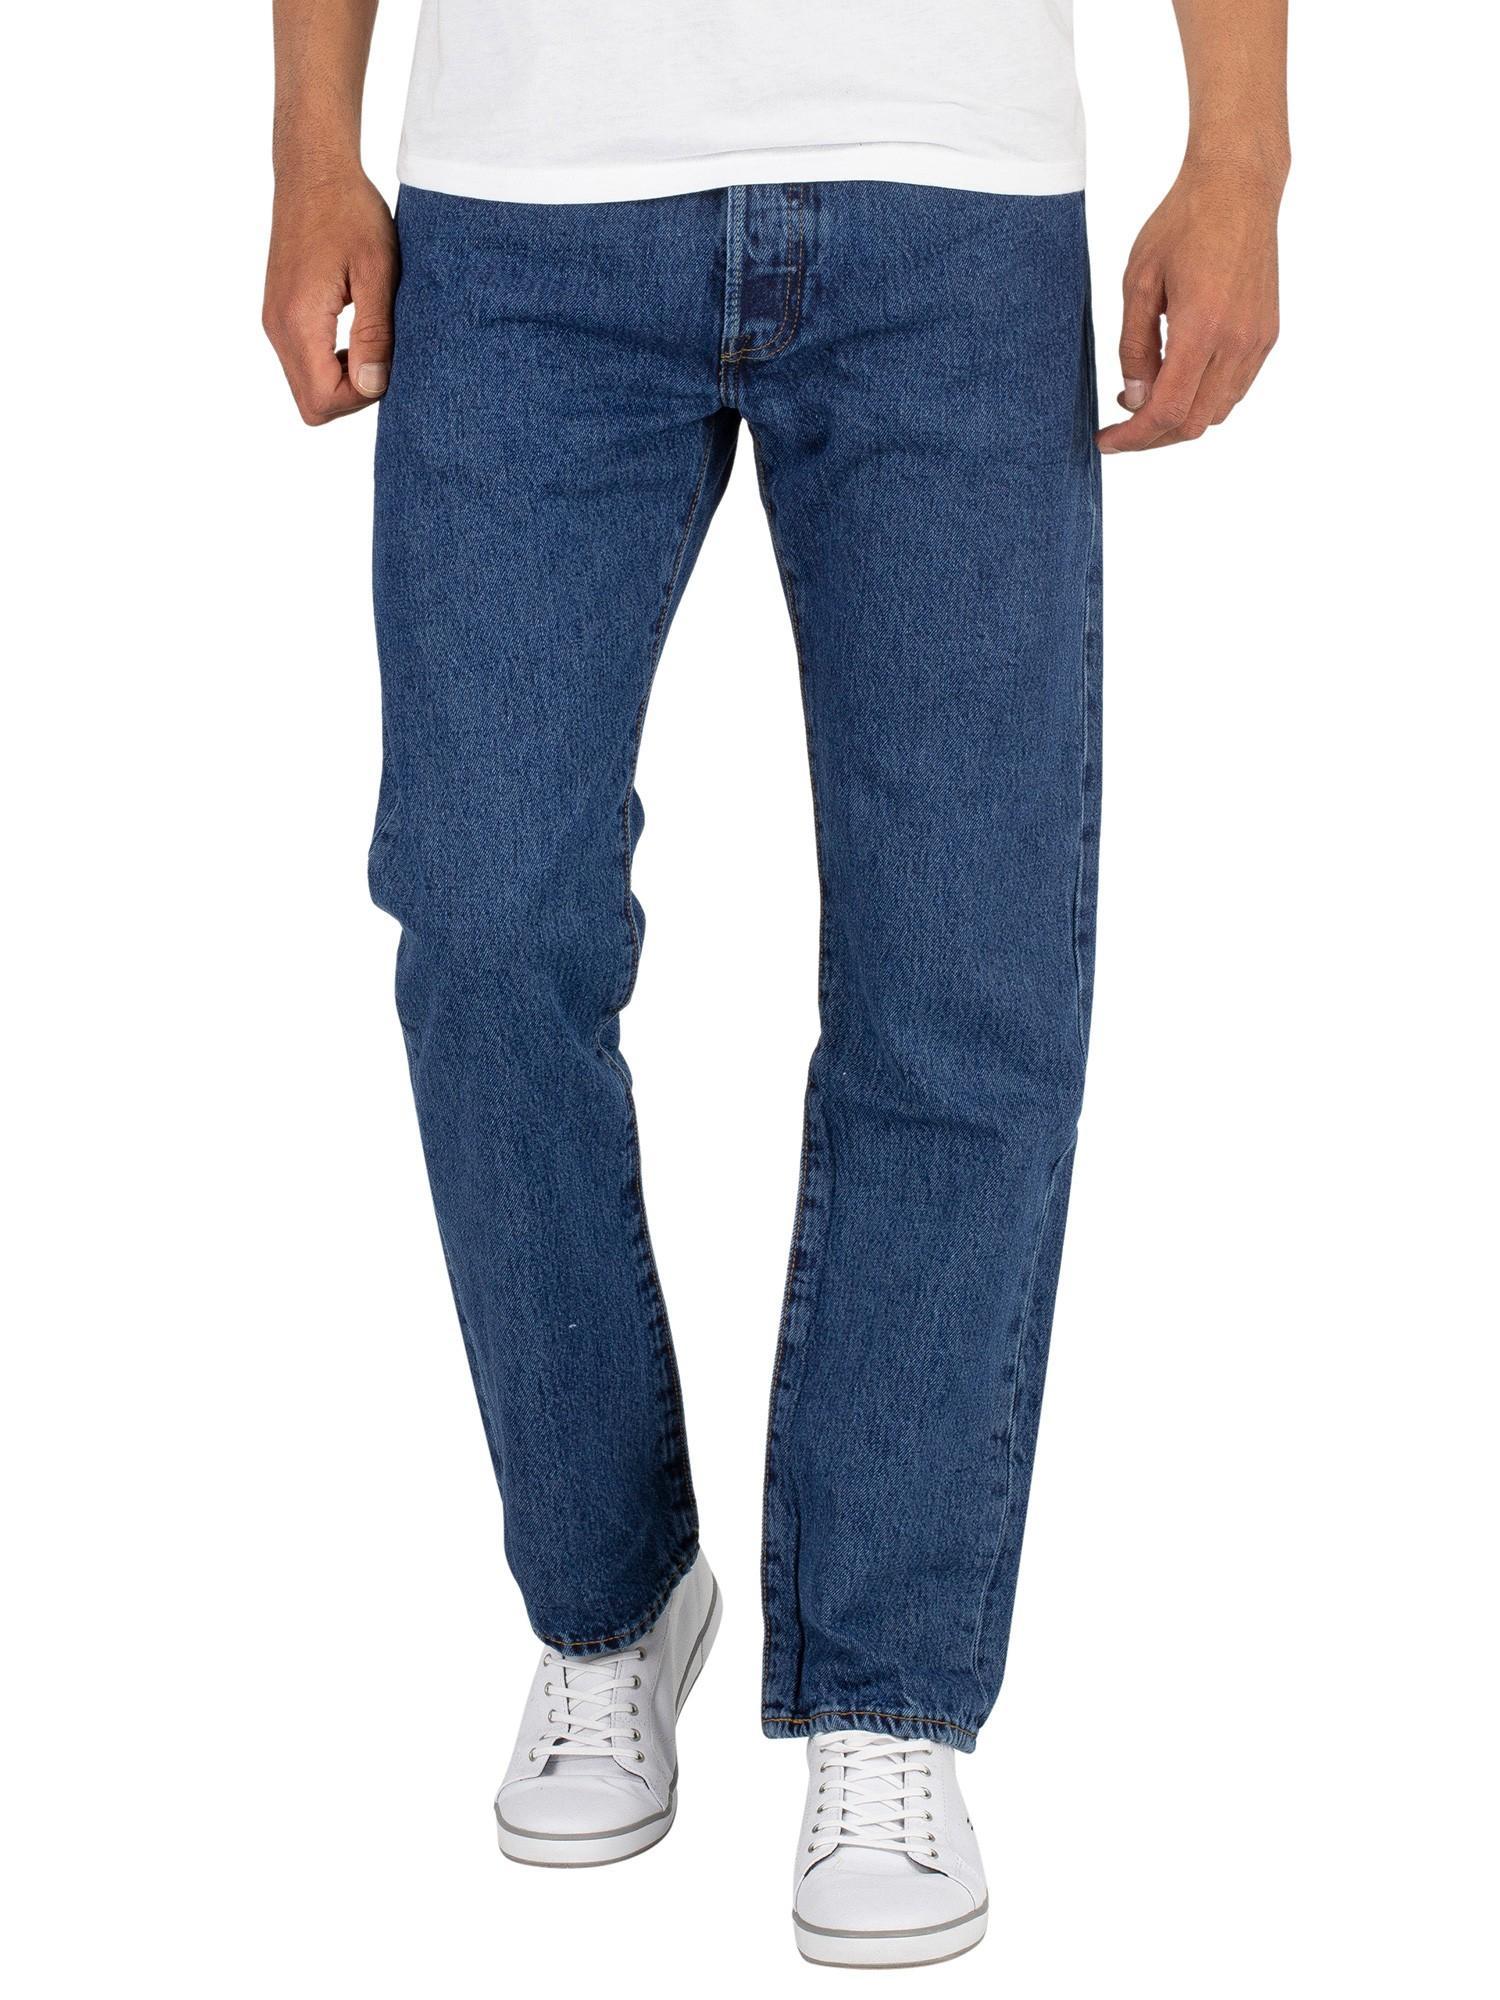 Levi's 501 Original Fit Denim Jeans in Stonewash (Blue ...